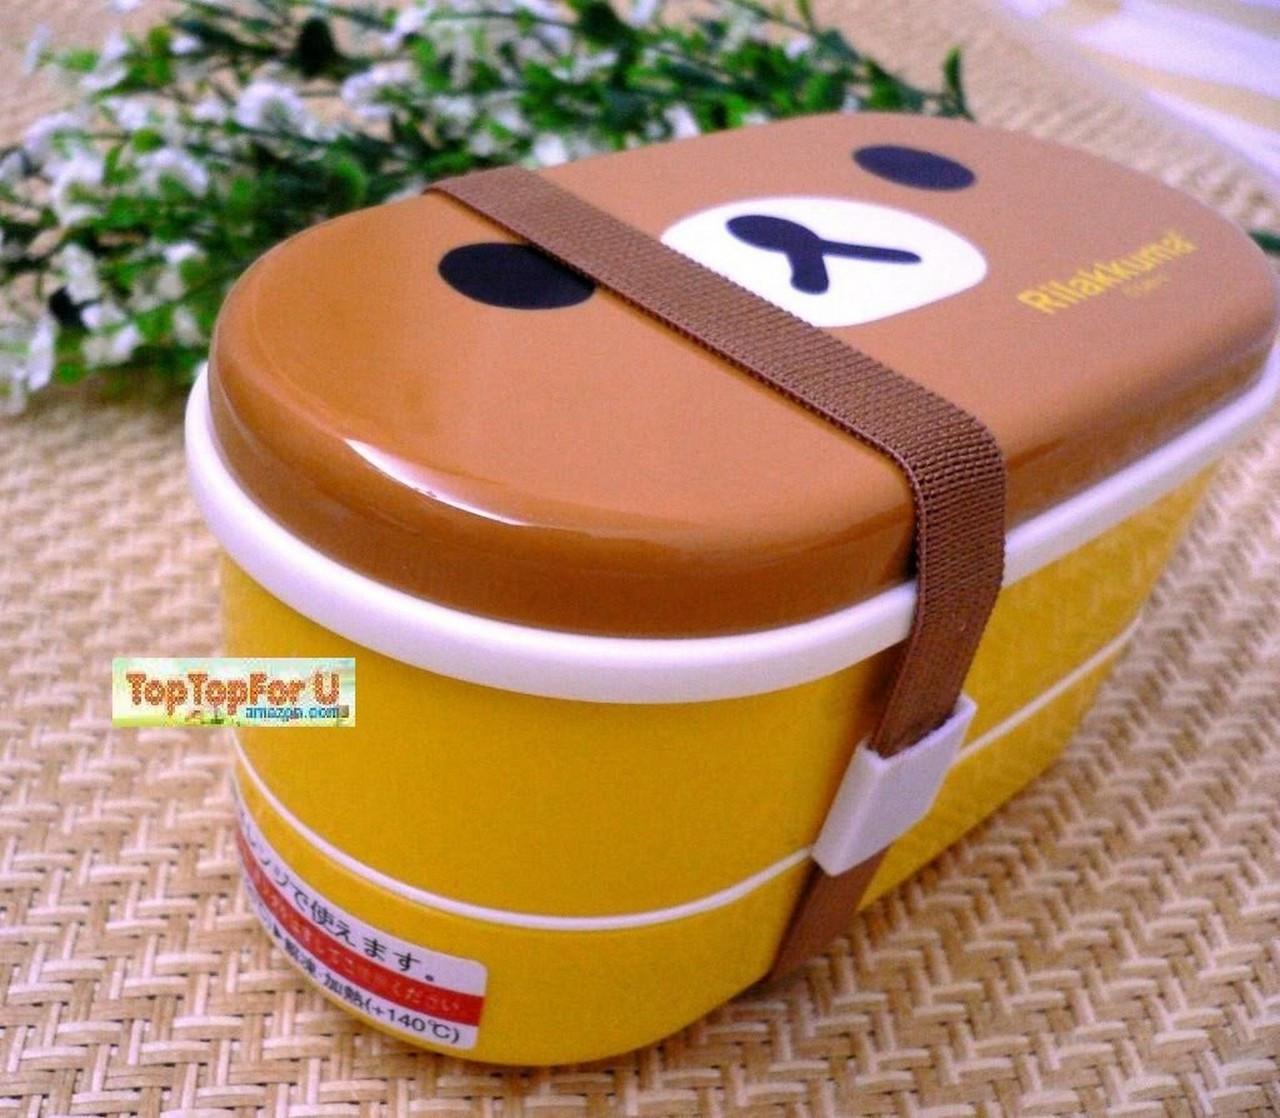 san x rilakkuma bear food lunch box bento w chopsticks japan bargain inc. Black Bedroom Furniture Sets. Home Design Ideas